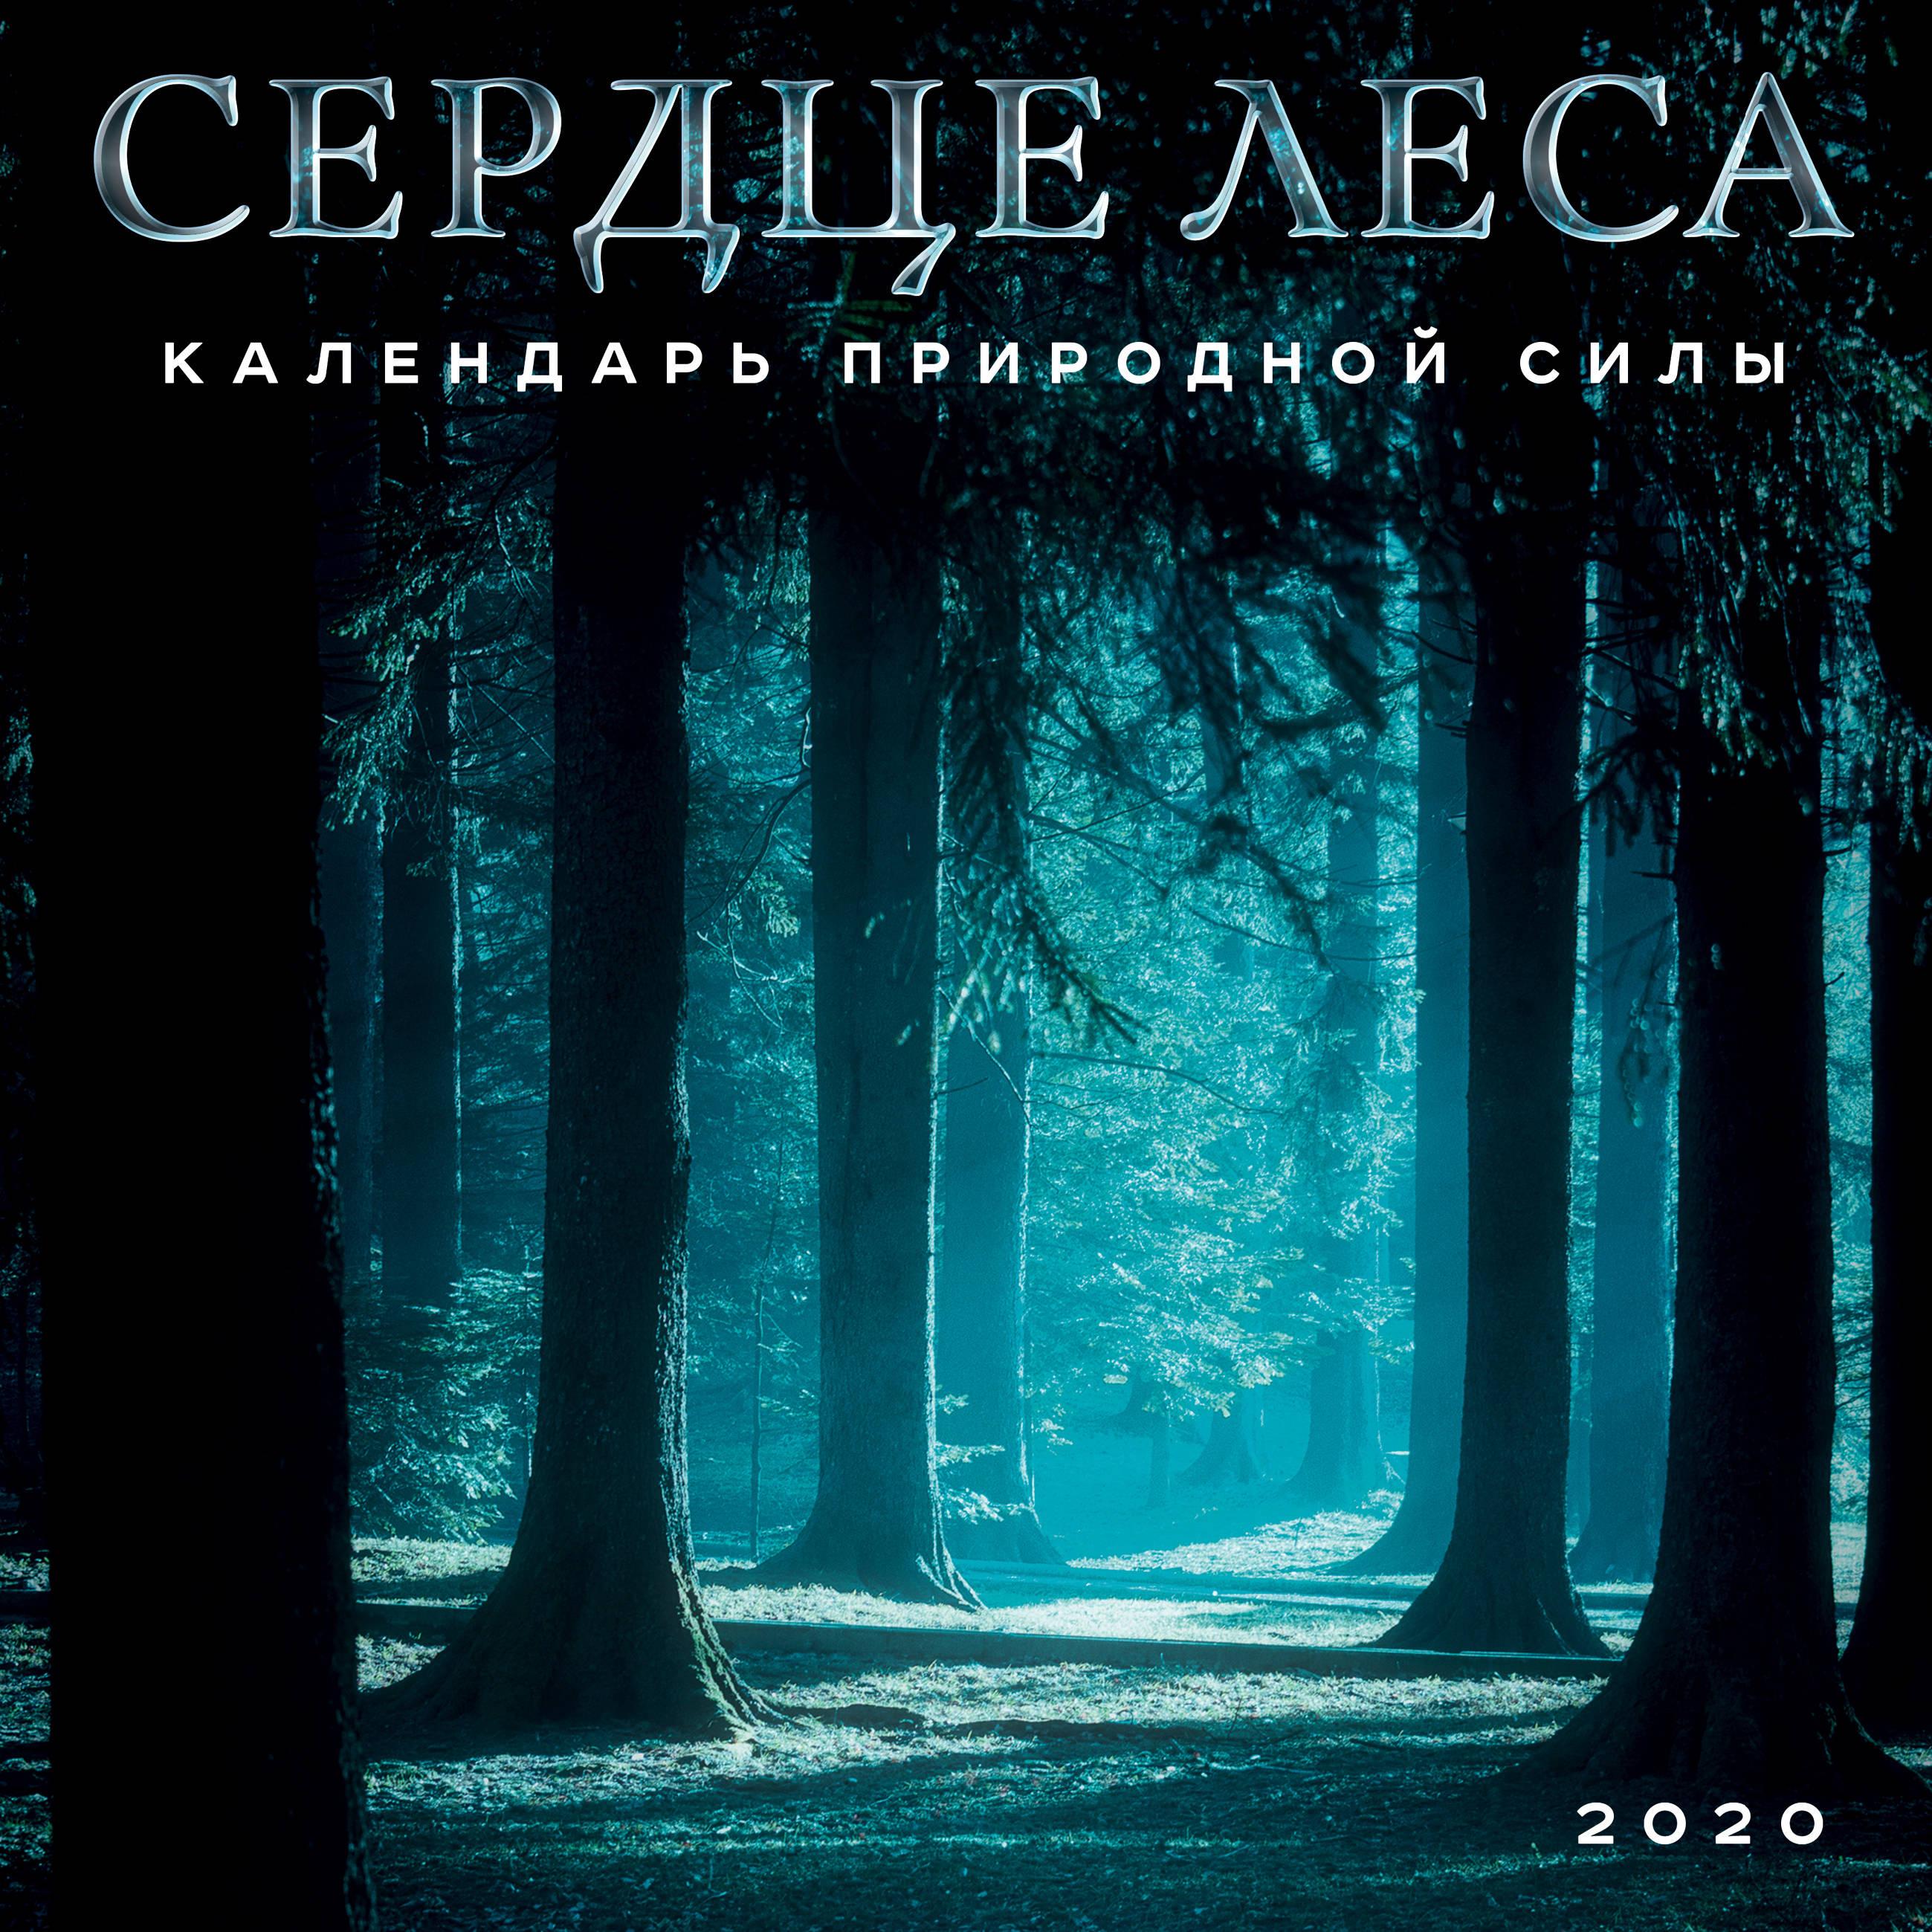 Serdtse lesa. Kalendar nastennyj na 2020 god (300kh300mm)